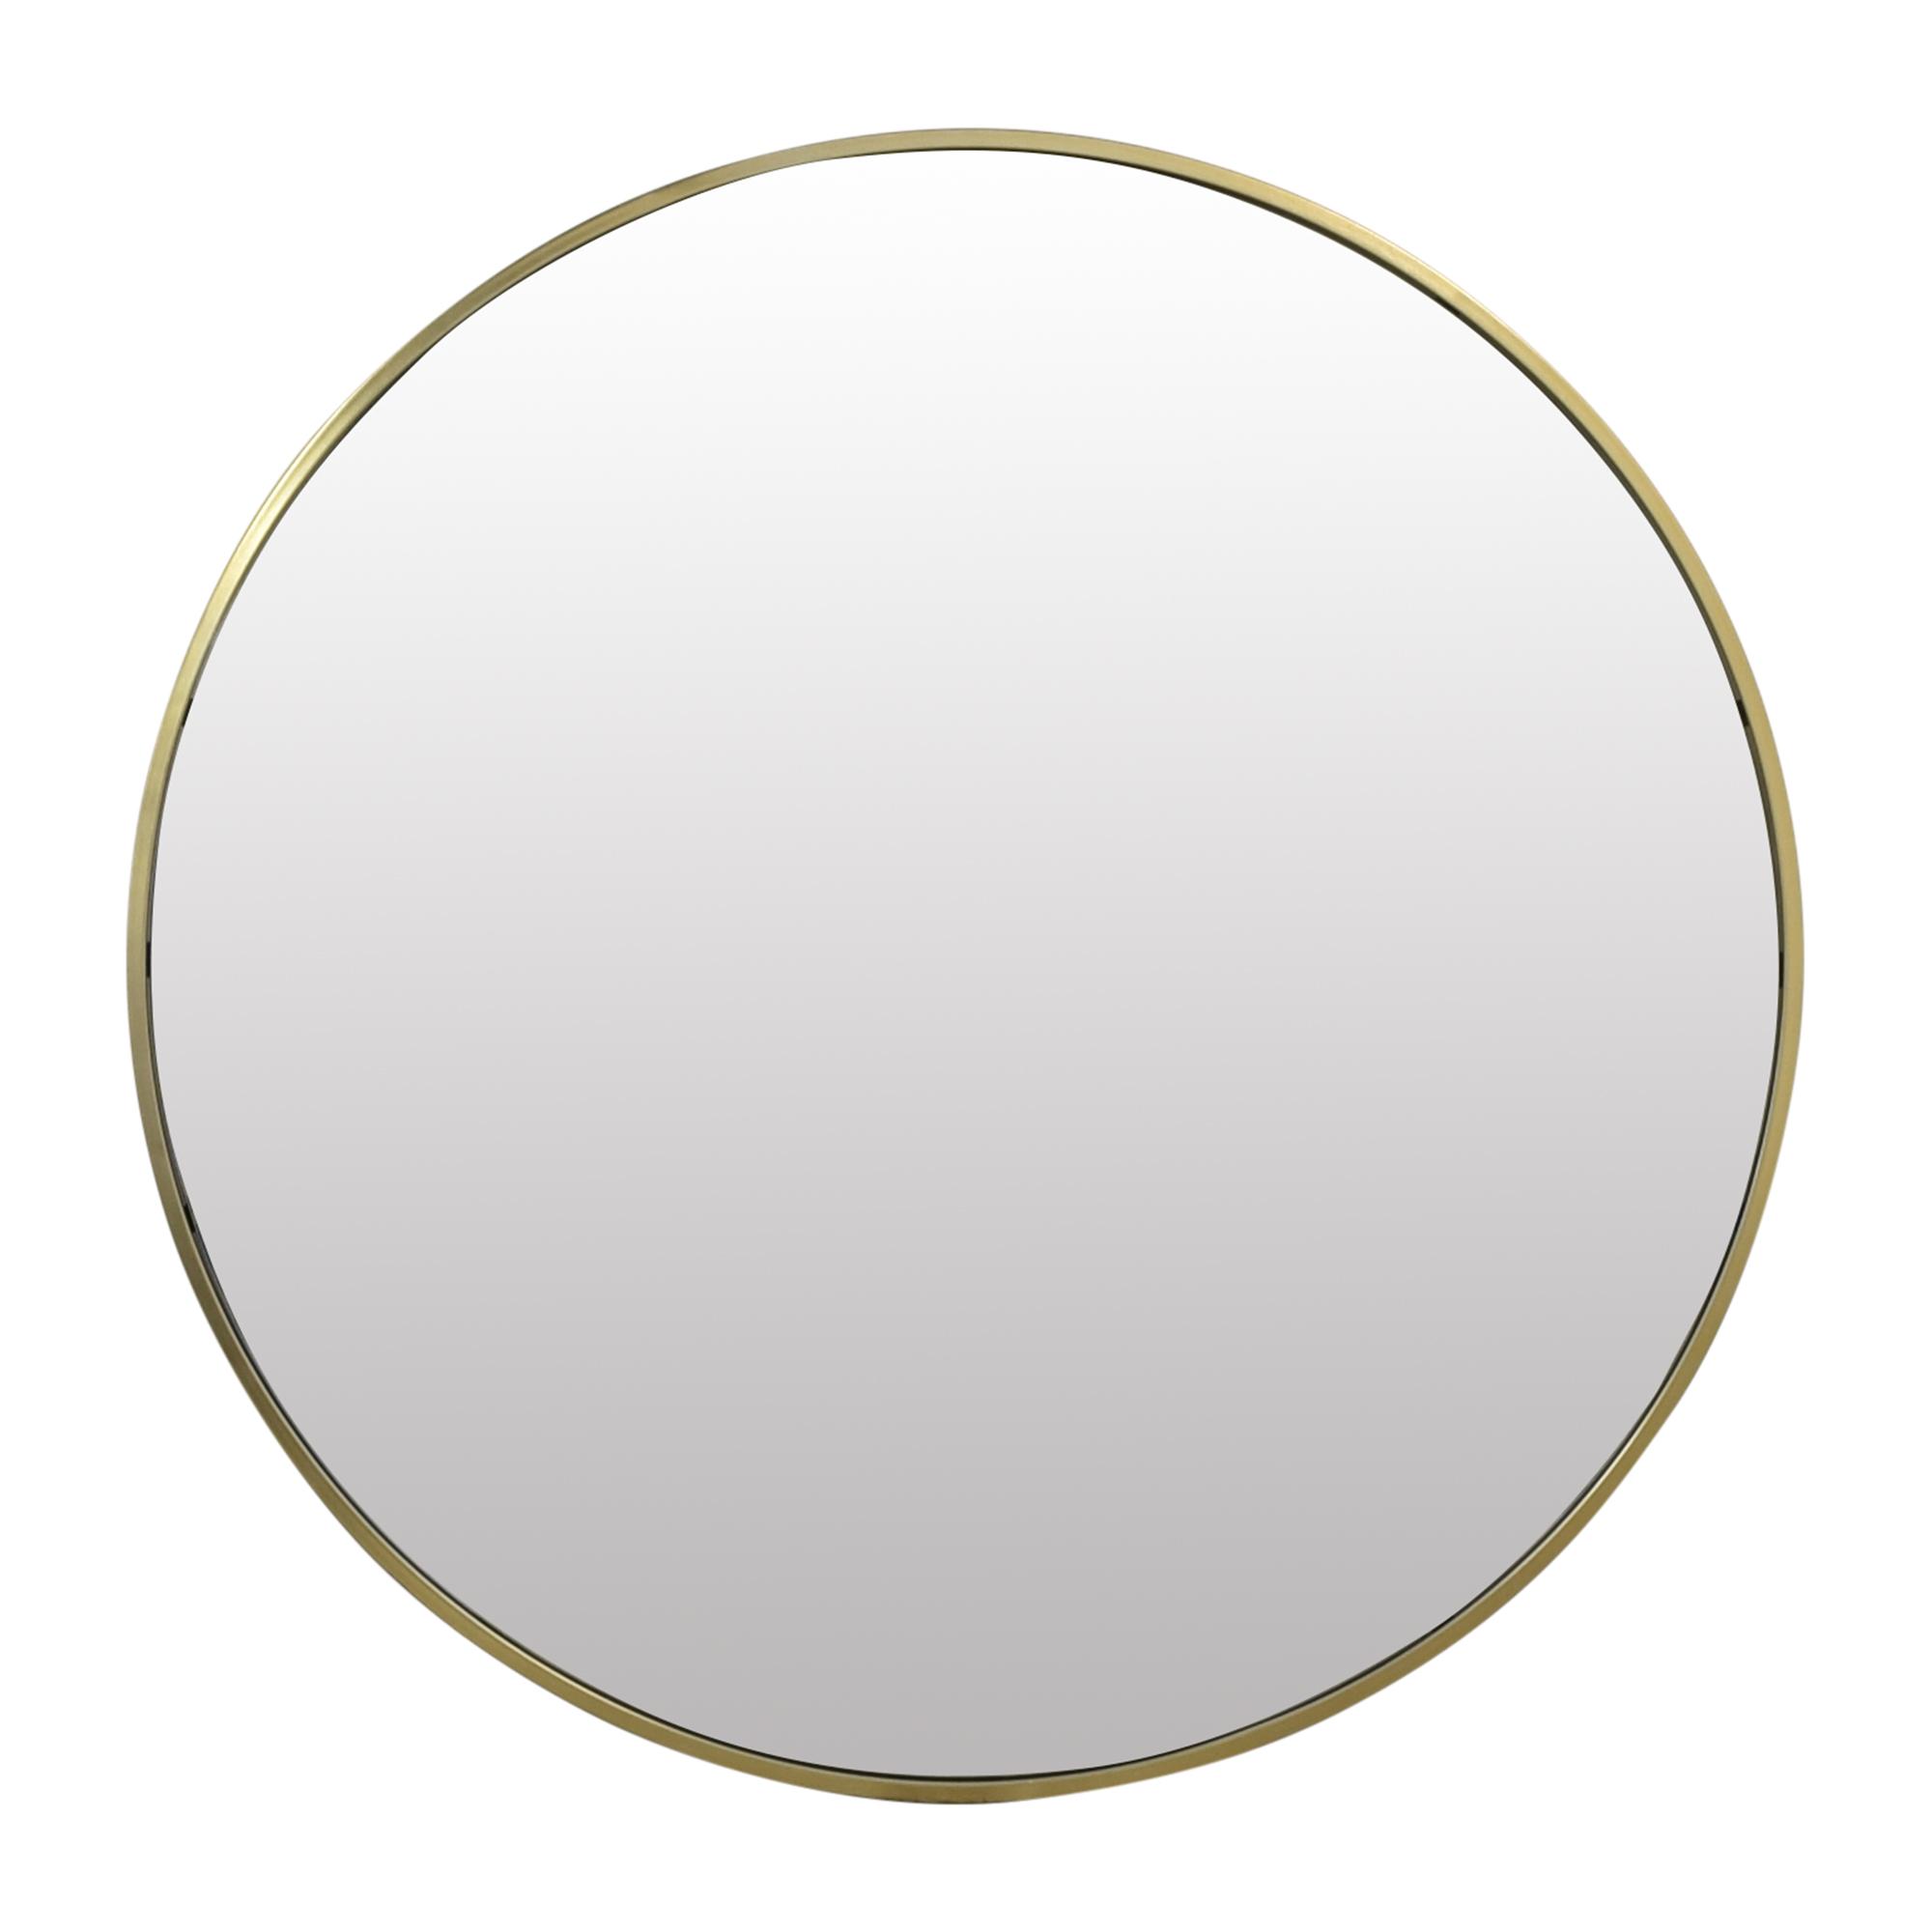 West Elm West Elm Metal Frame Oversized Round Mirror nj